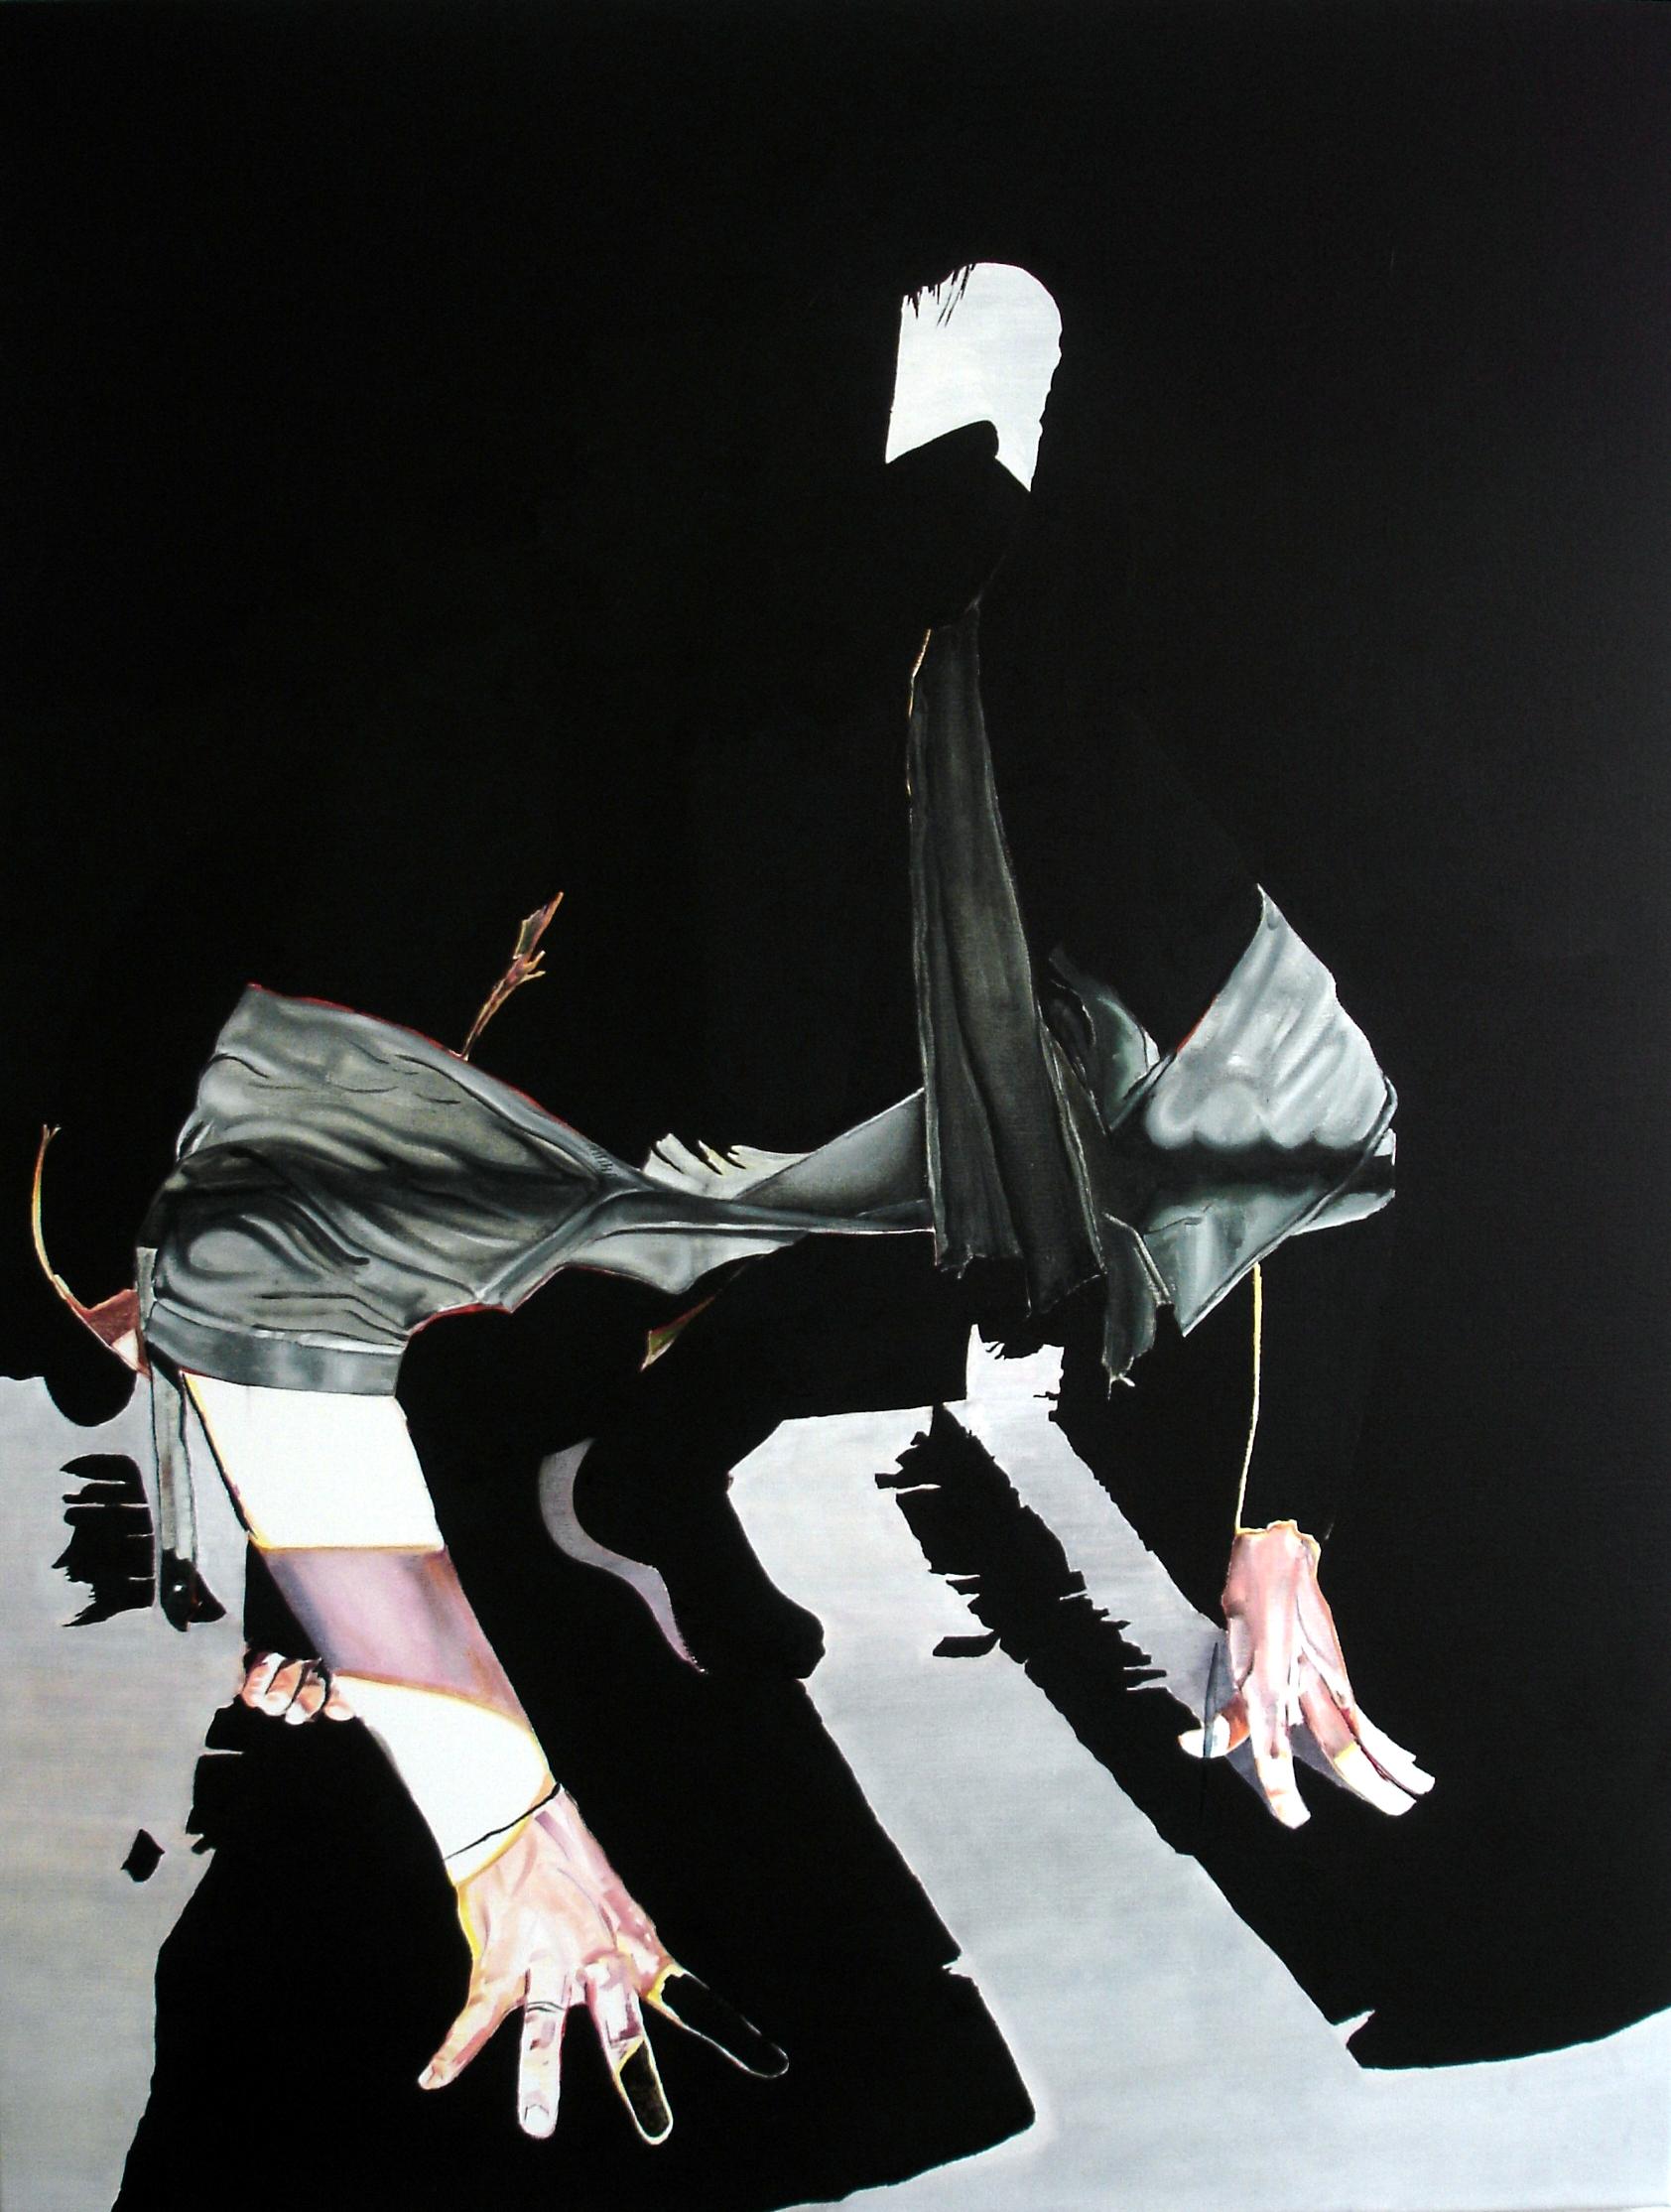 Wouter van de Koot painting woman crouching blindfold